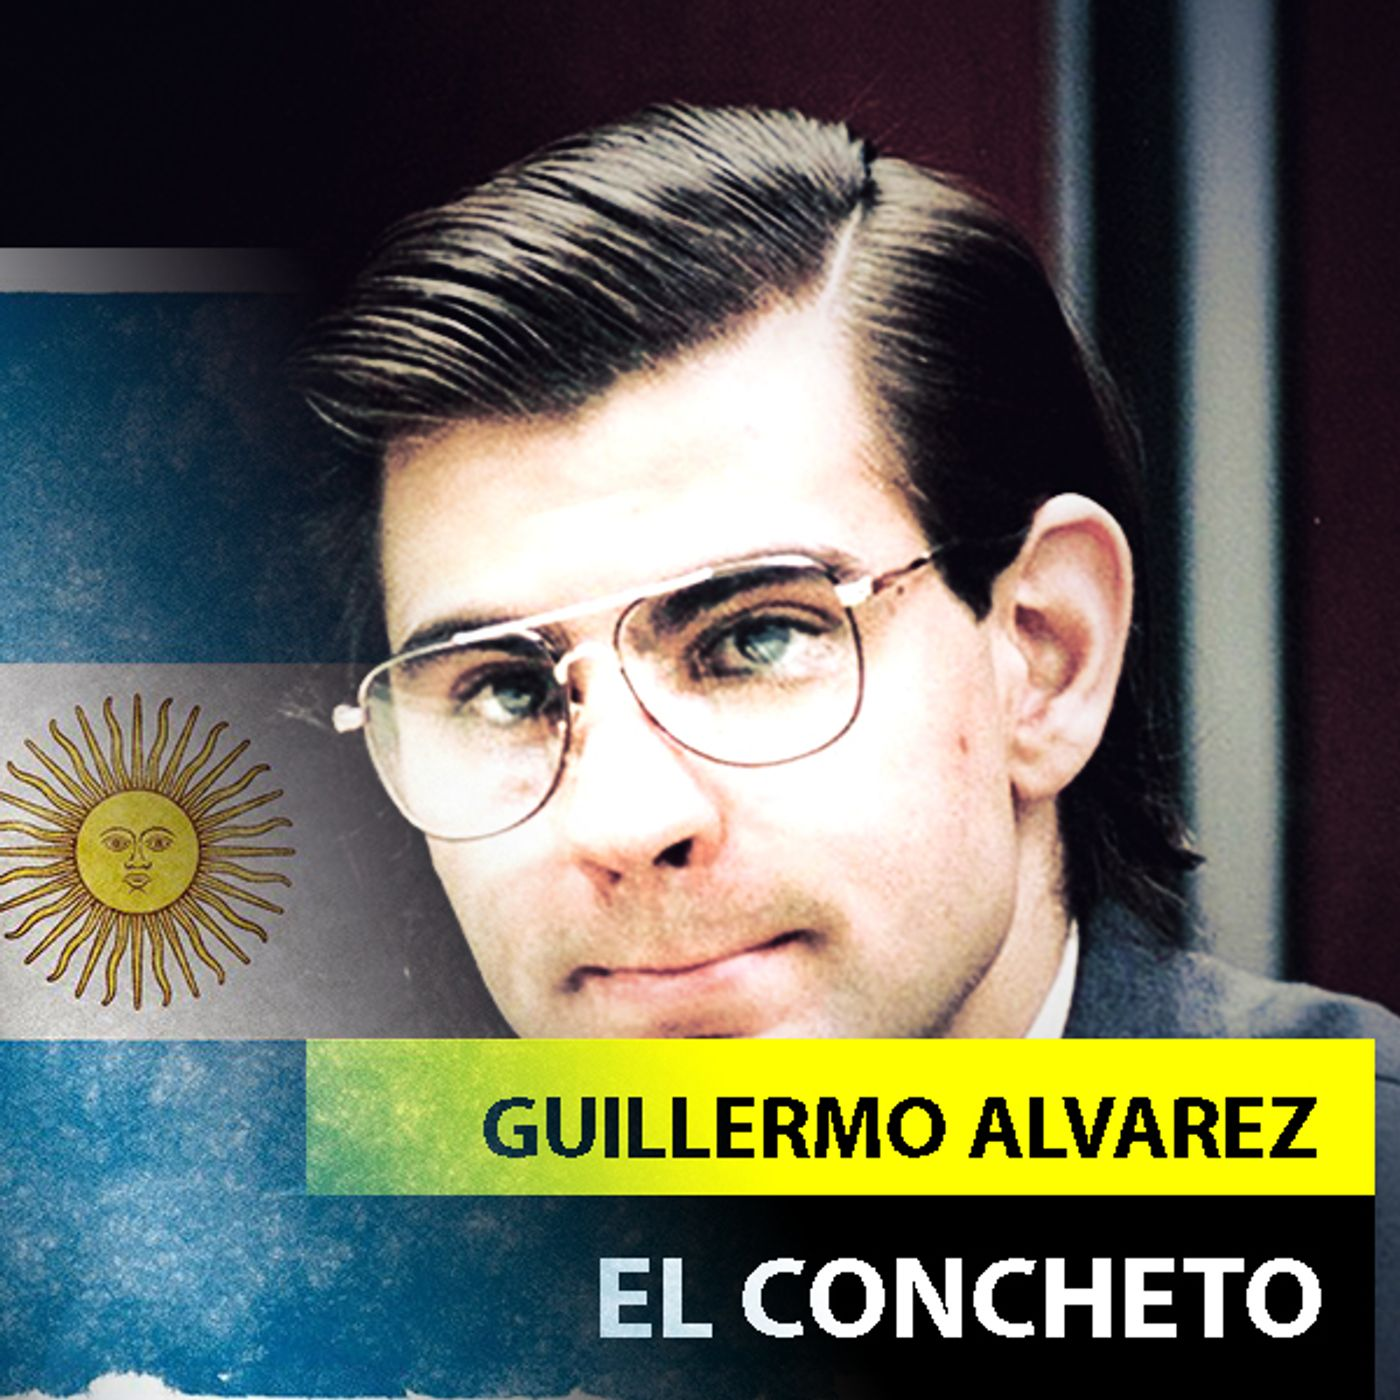 Guillermo Antonio Alvarez | El Concheto